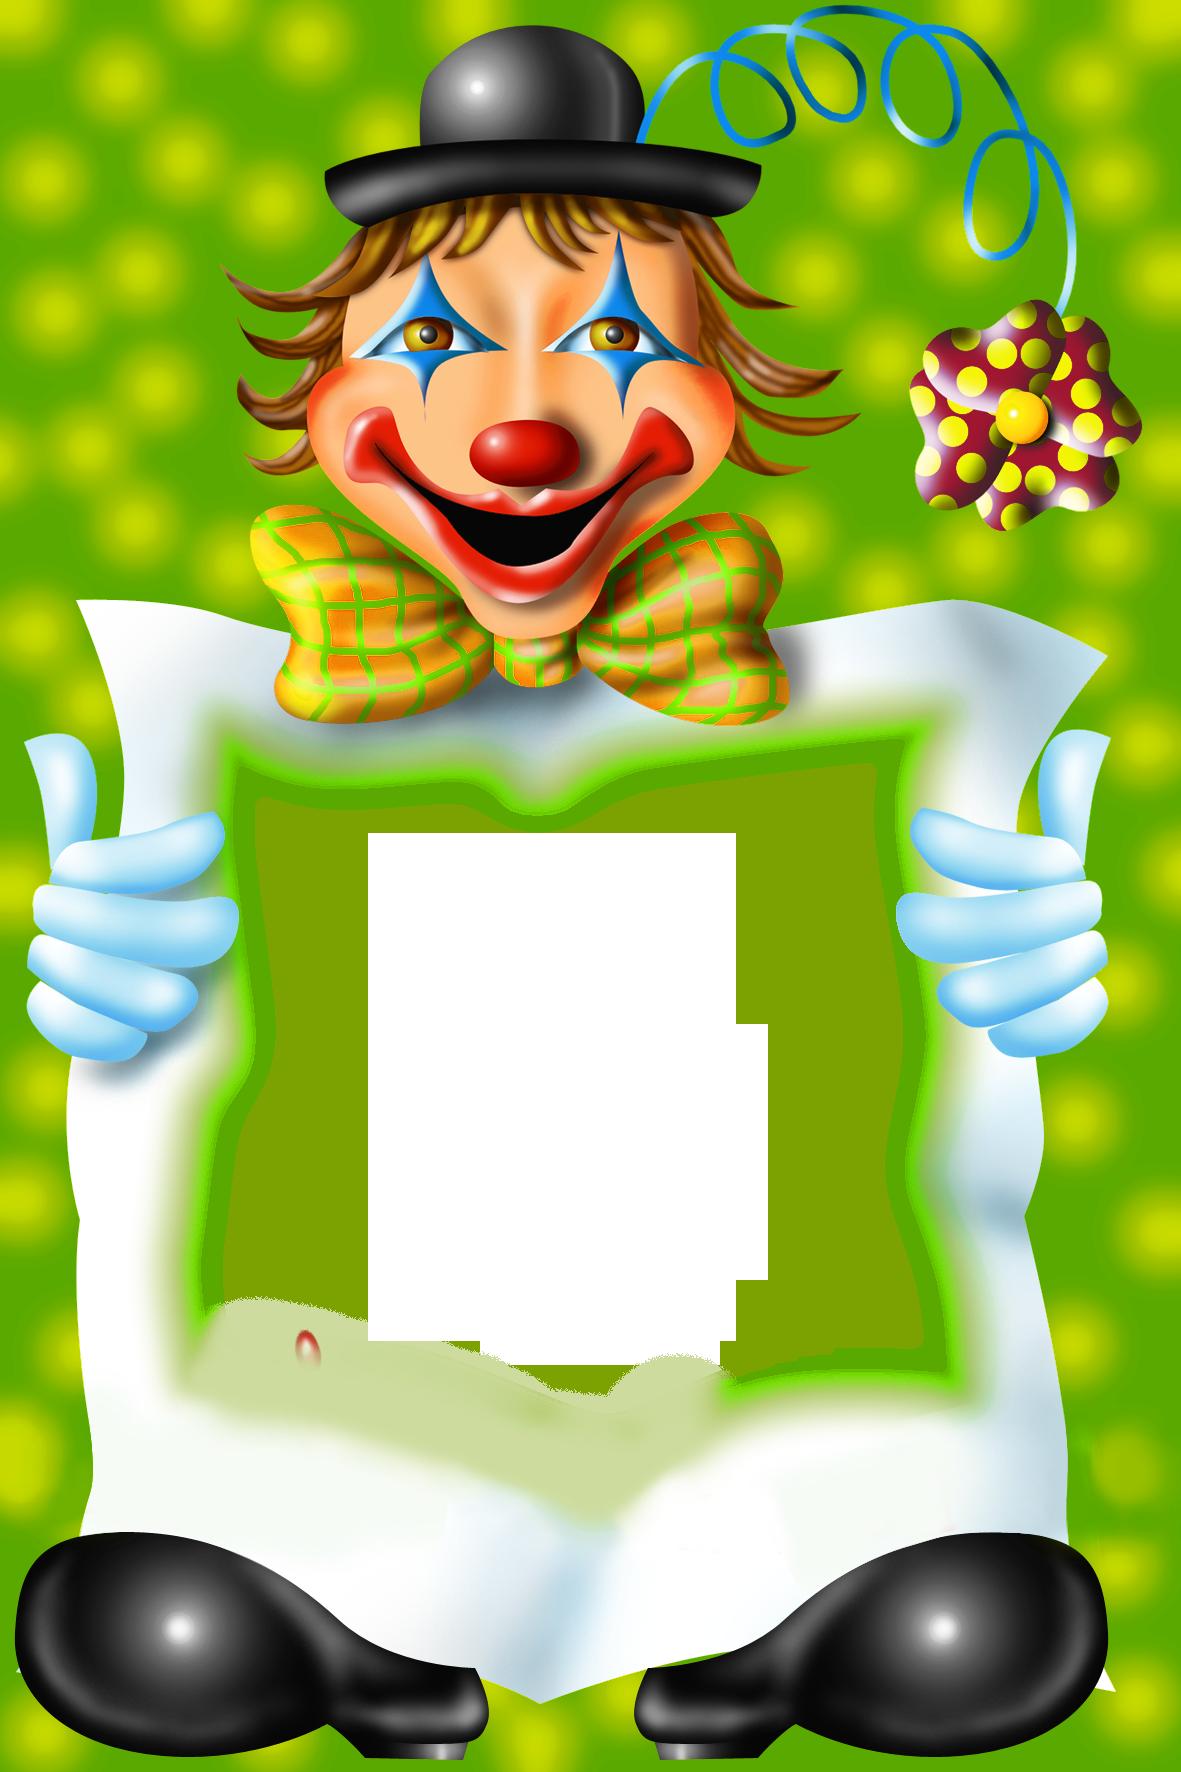 Clown clipart bow. Transparent png photo frame